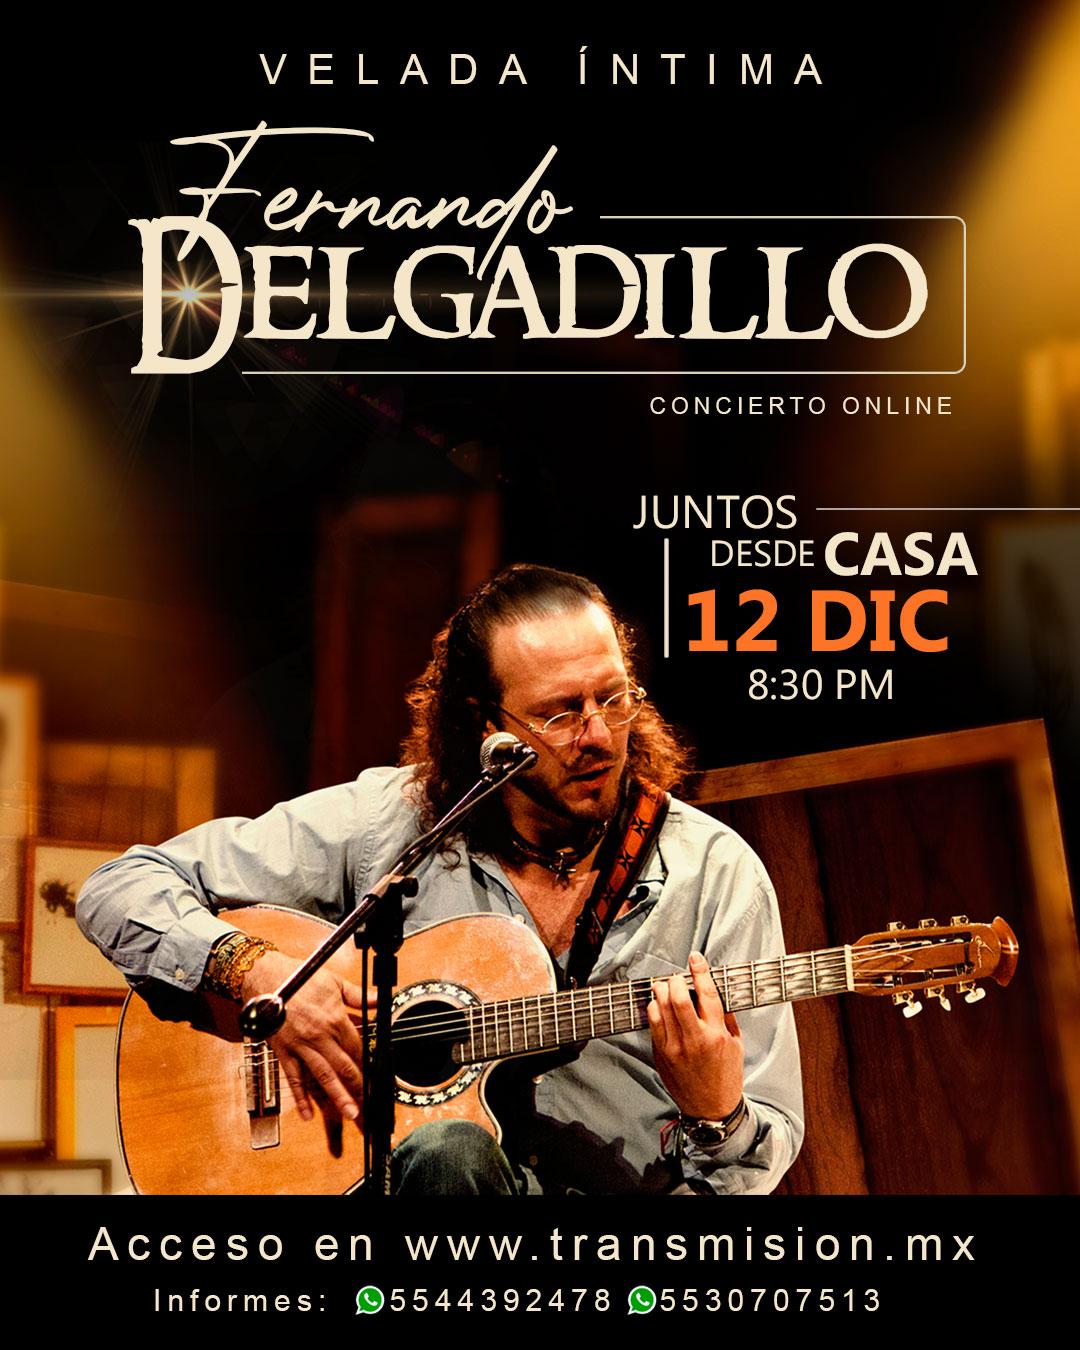 concierto_vivo